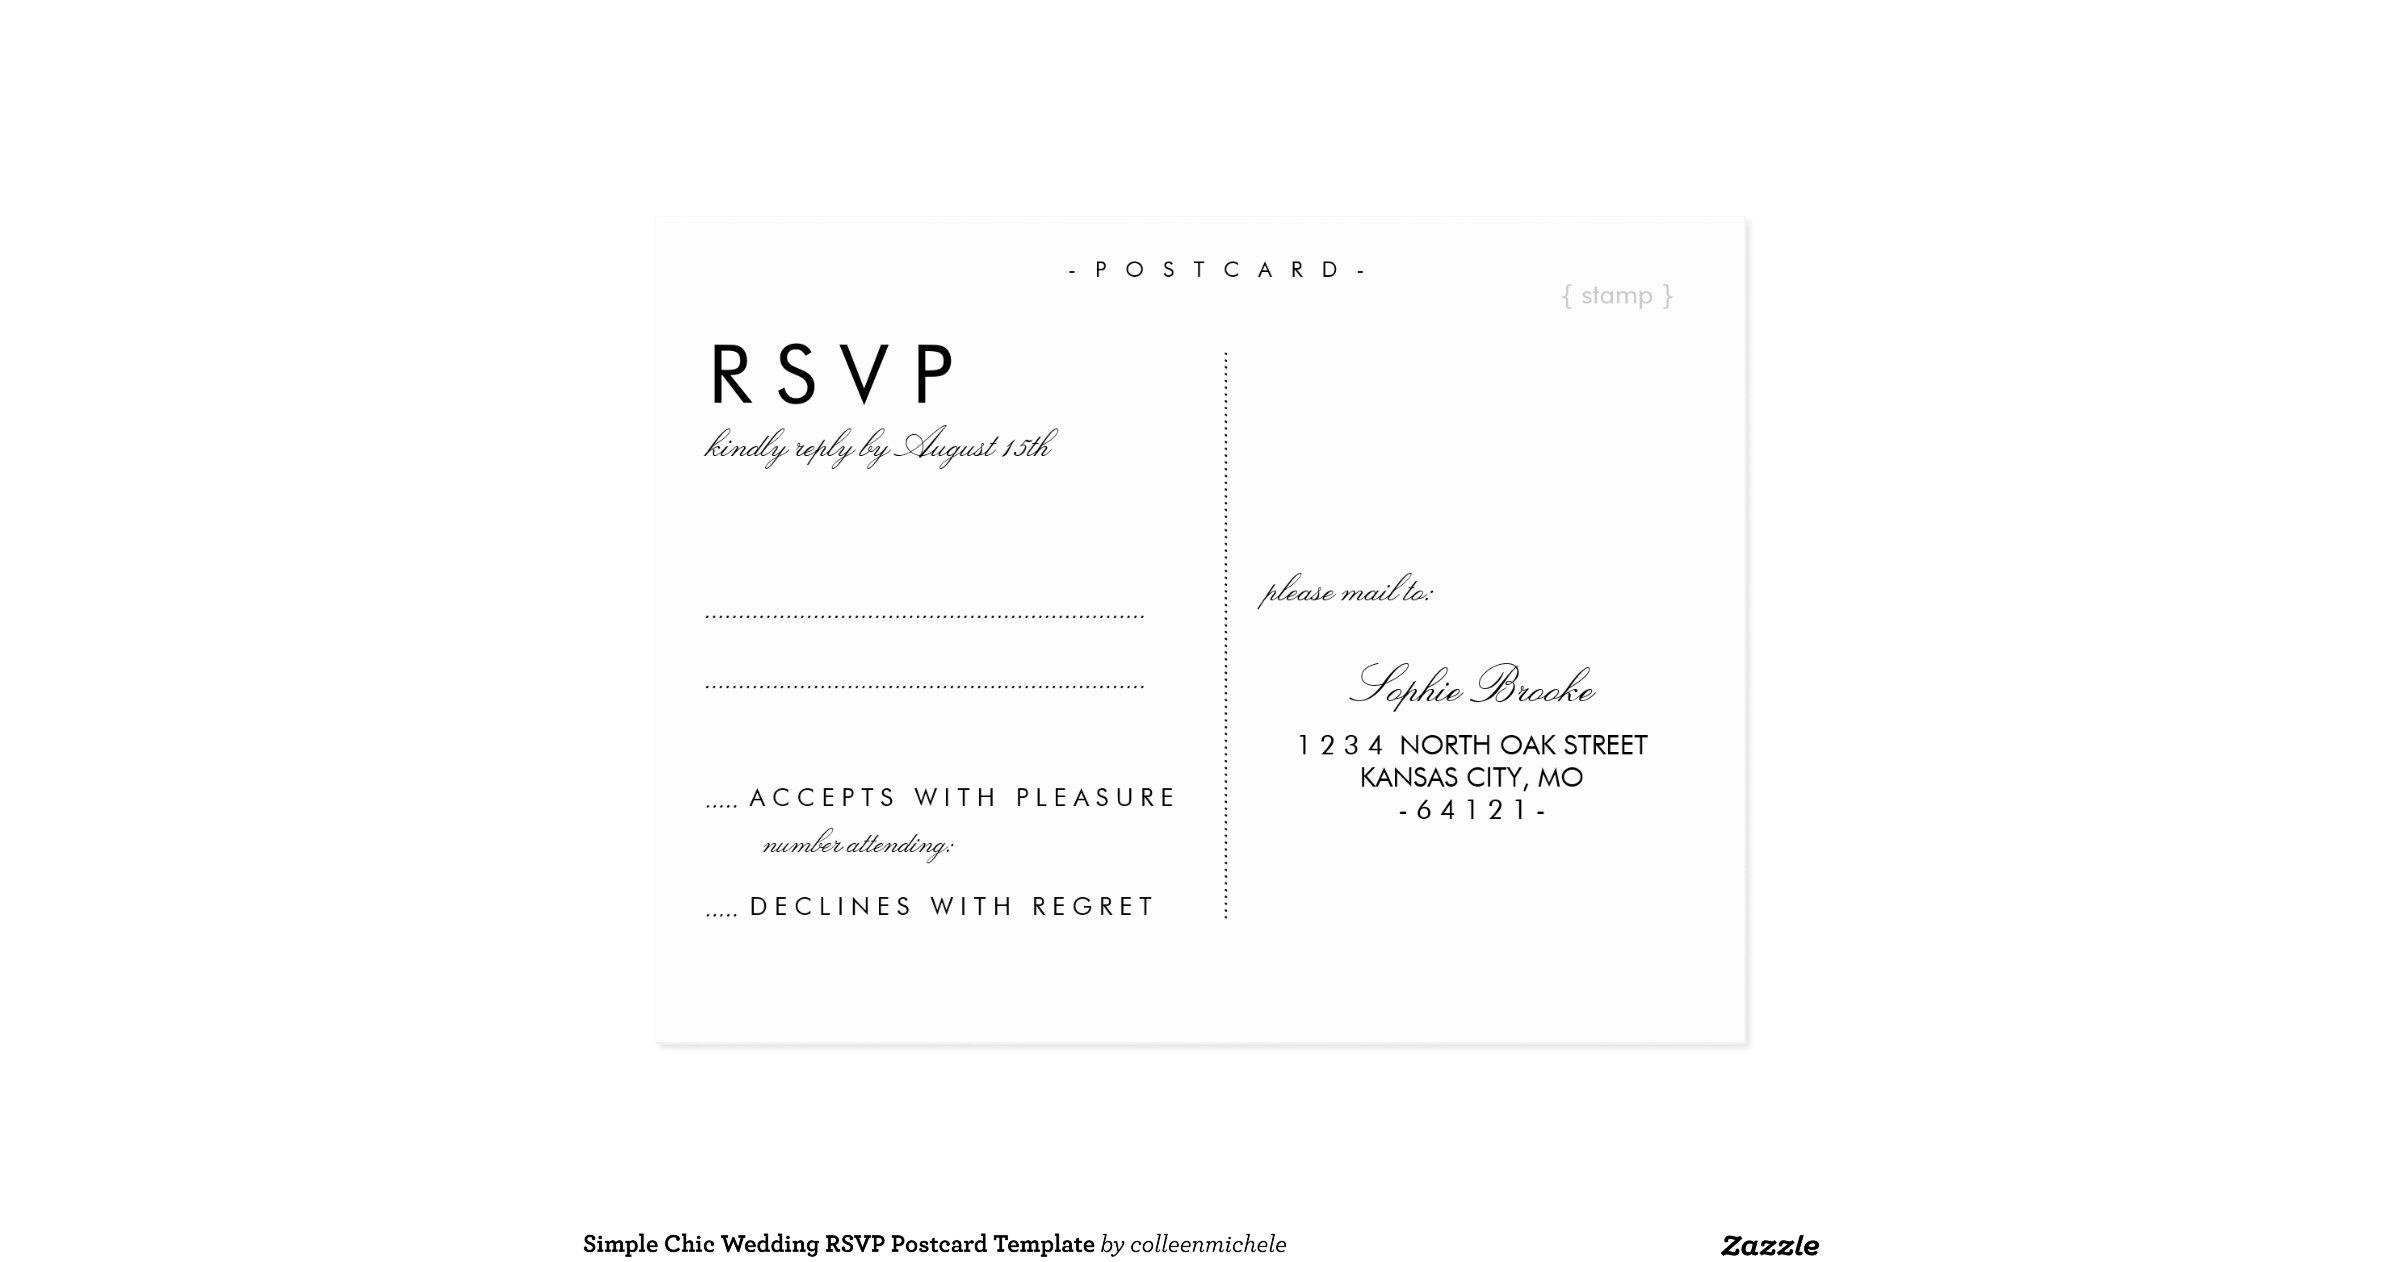 simple chic wedding rsvp postcard template zazzle